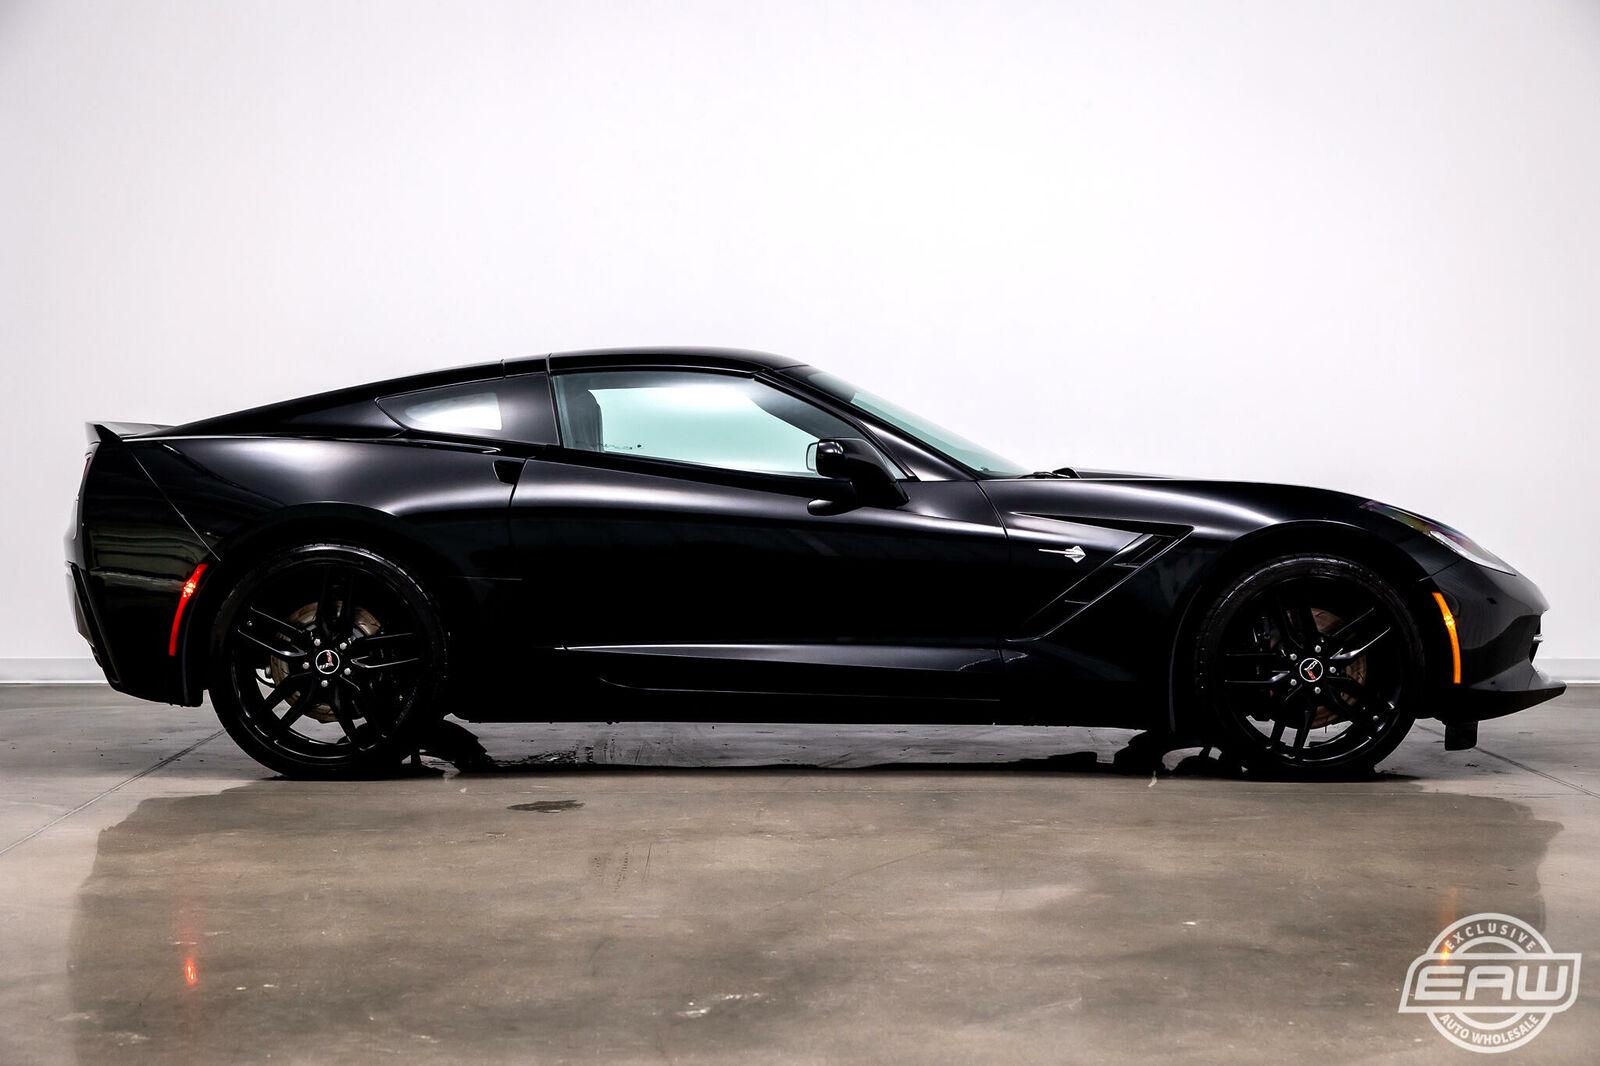 2014 Black Chevrolet Corvette Coupe 1LT | C7 Corvette Photo 9